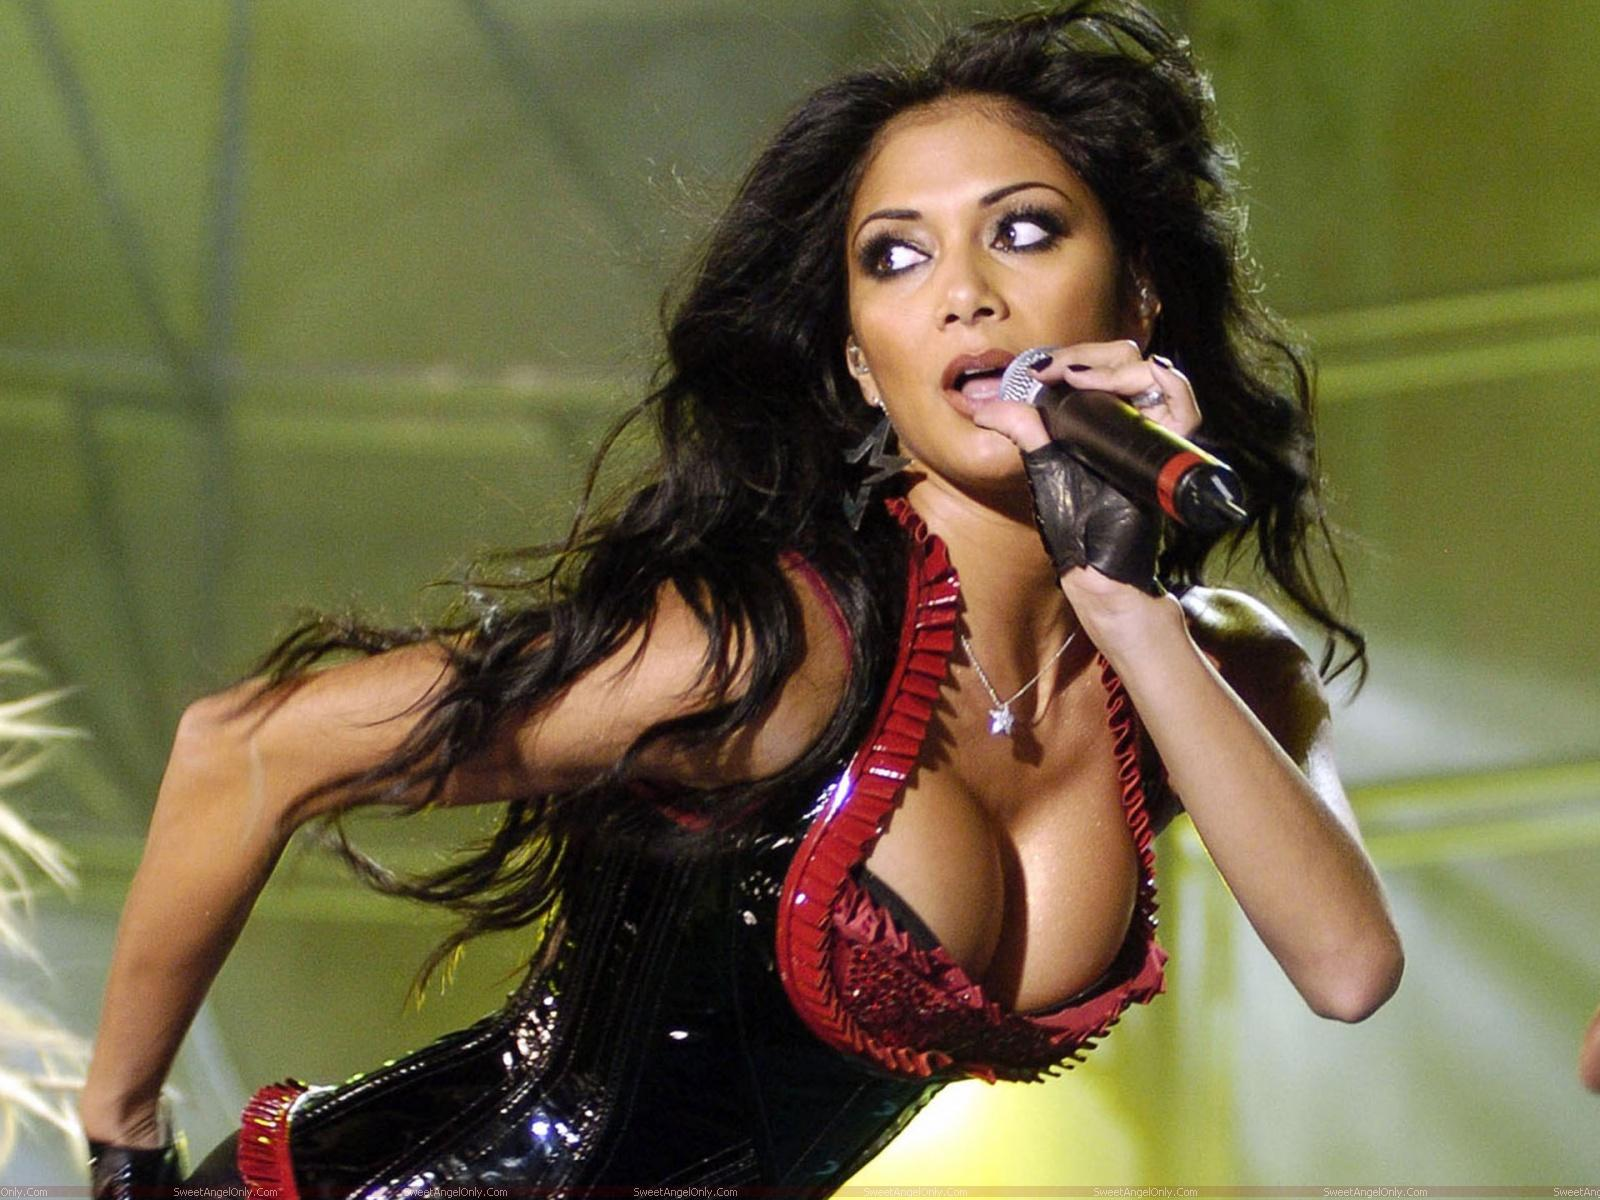 Nicole-Scherzinger-Hot